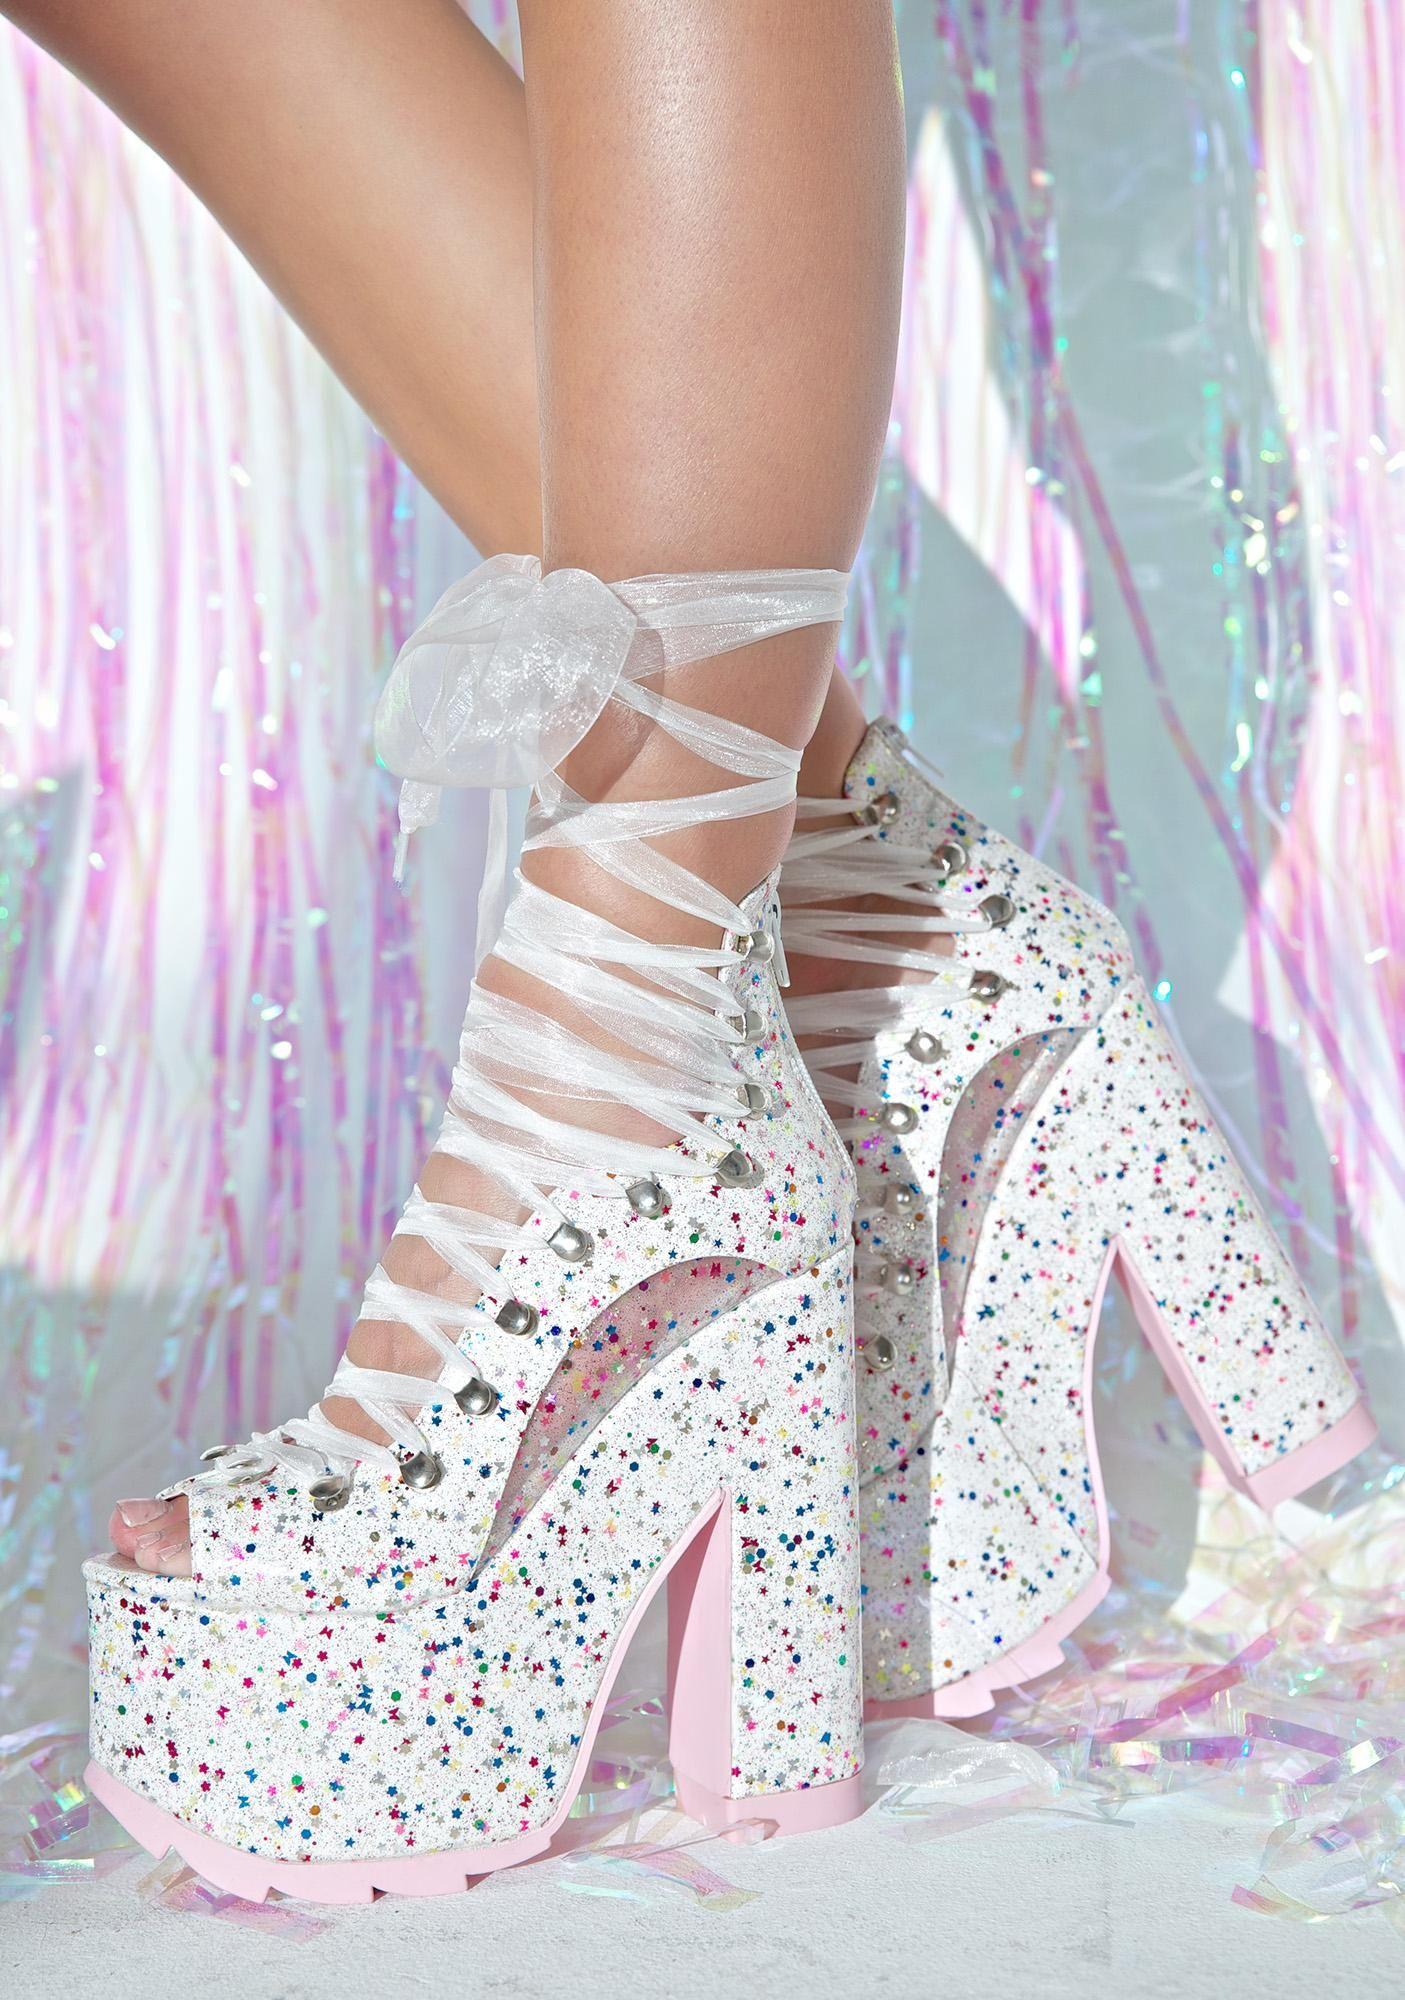 White Sparkle Ballet Bae Platforms | Bae, Dolls and High heel